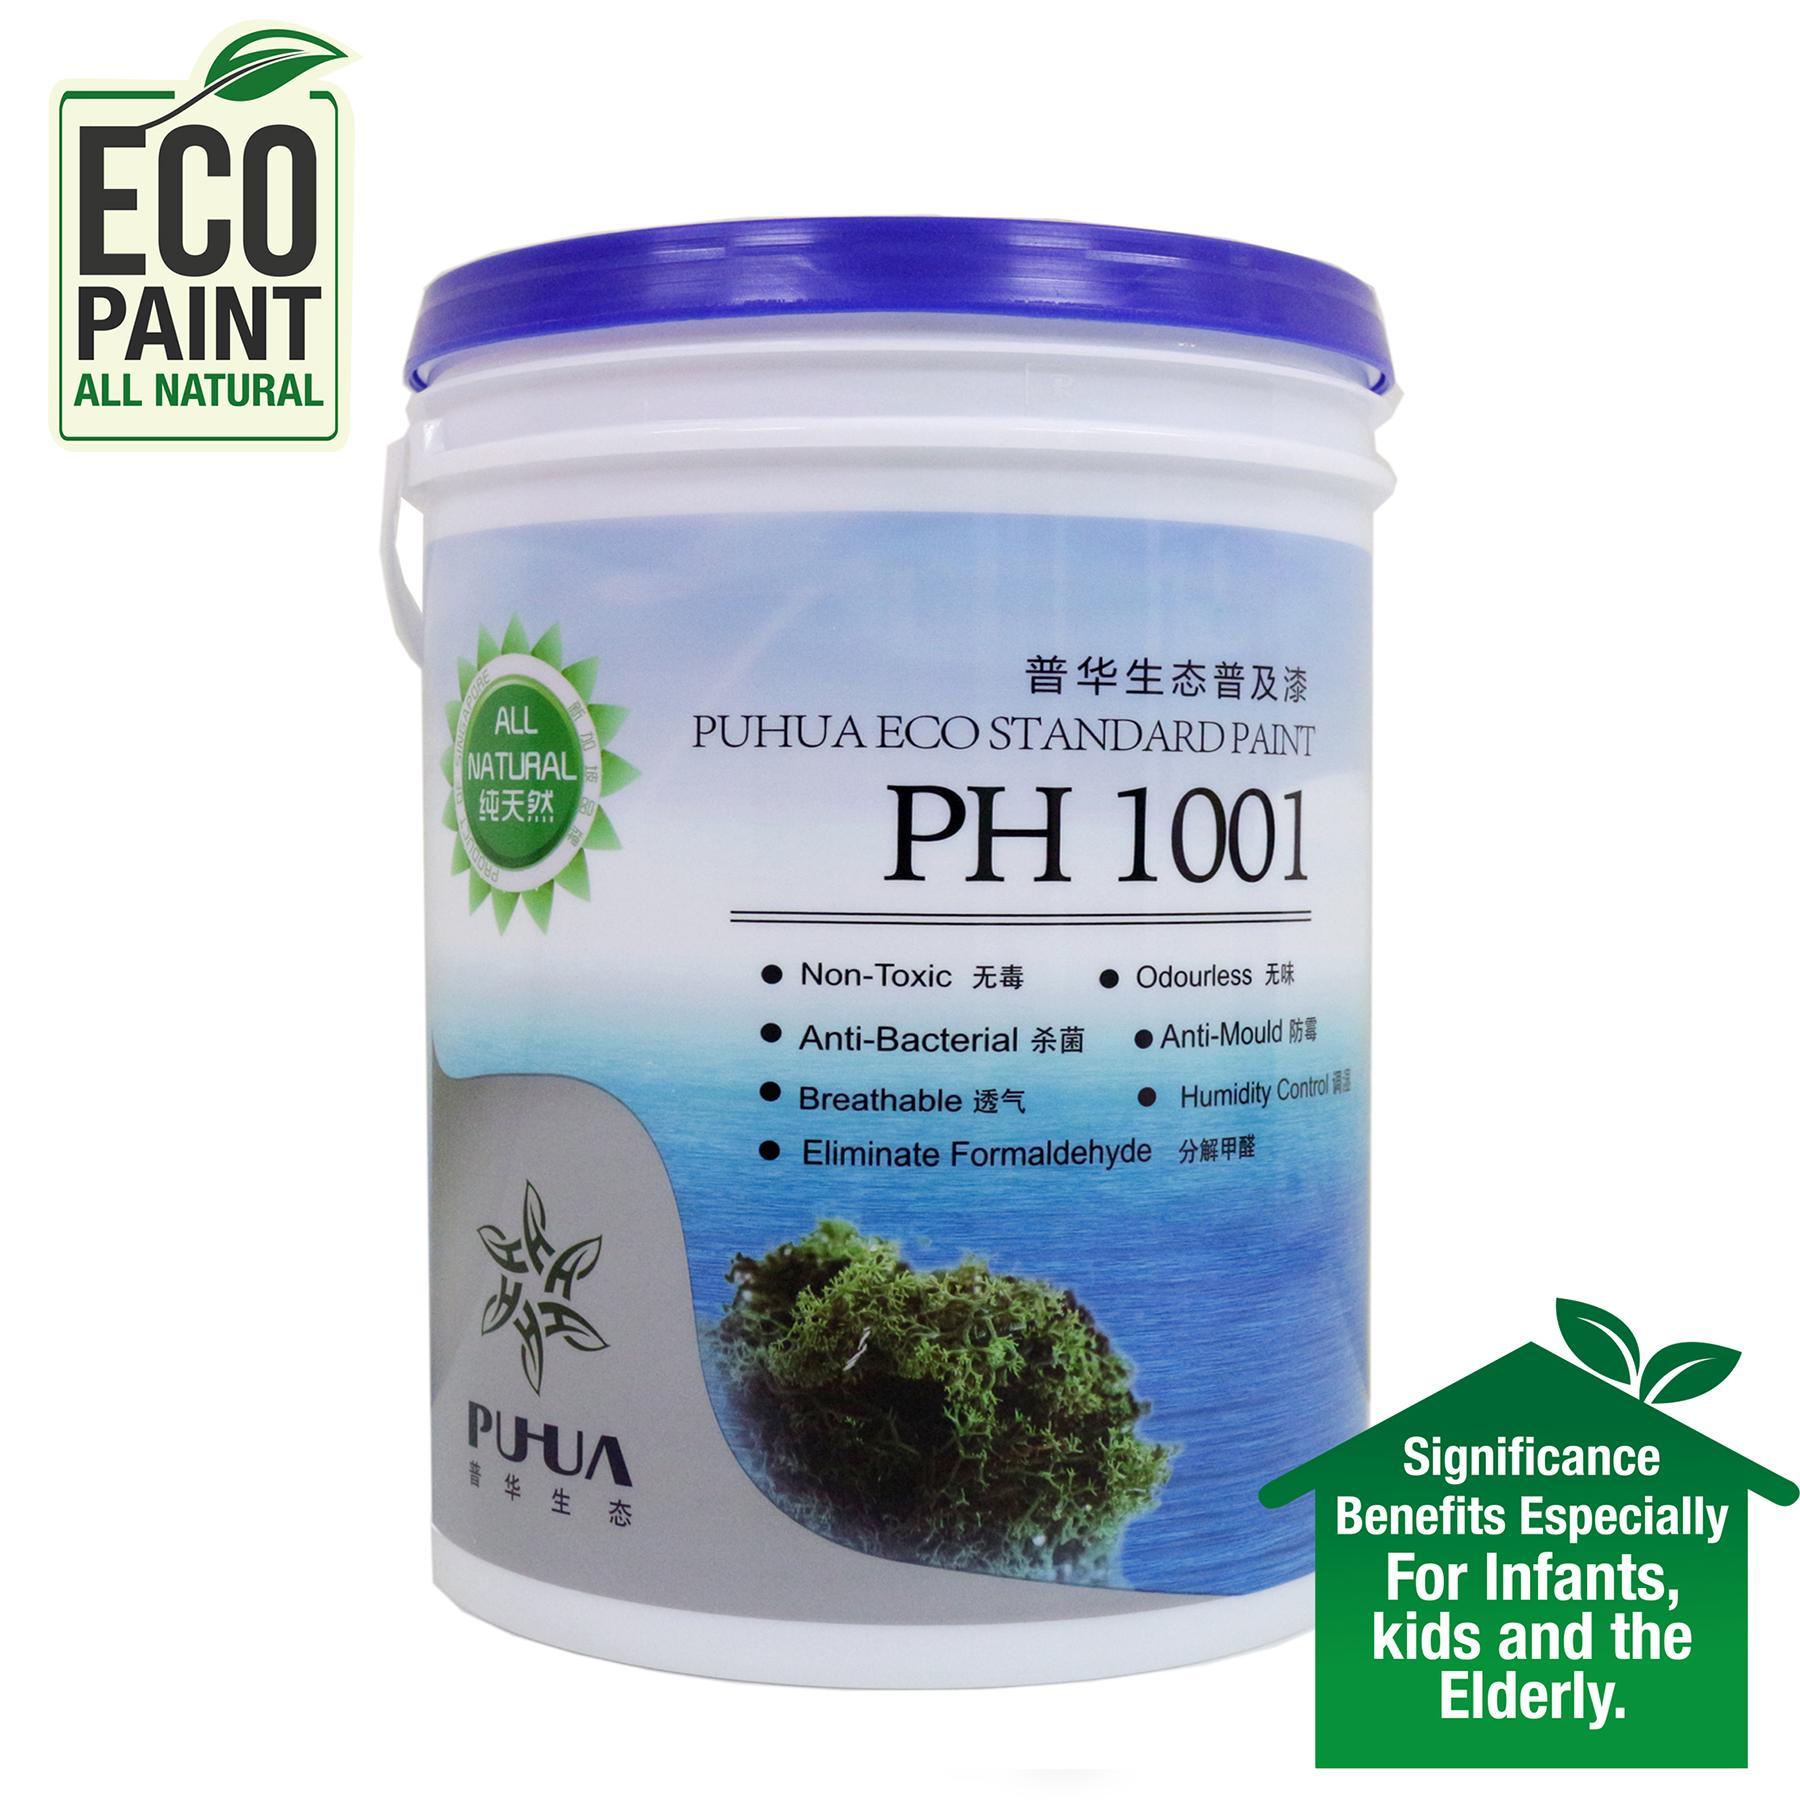 Puhua Eco Paint 1001 - ZERO VOC - Interior Wall Paint 5L